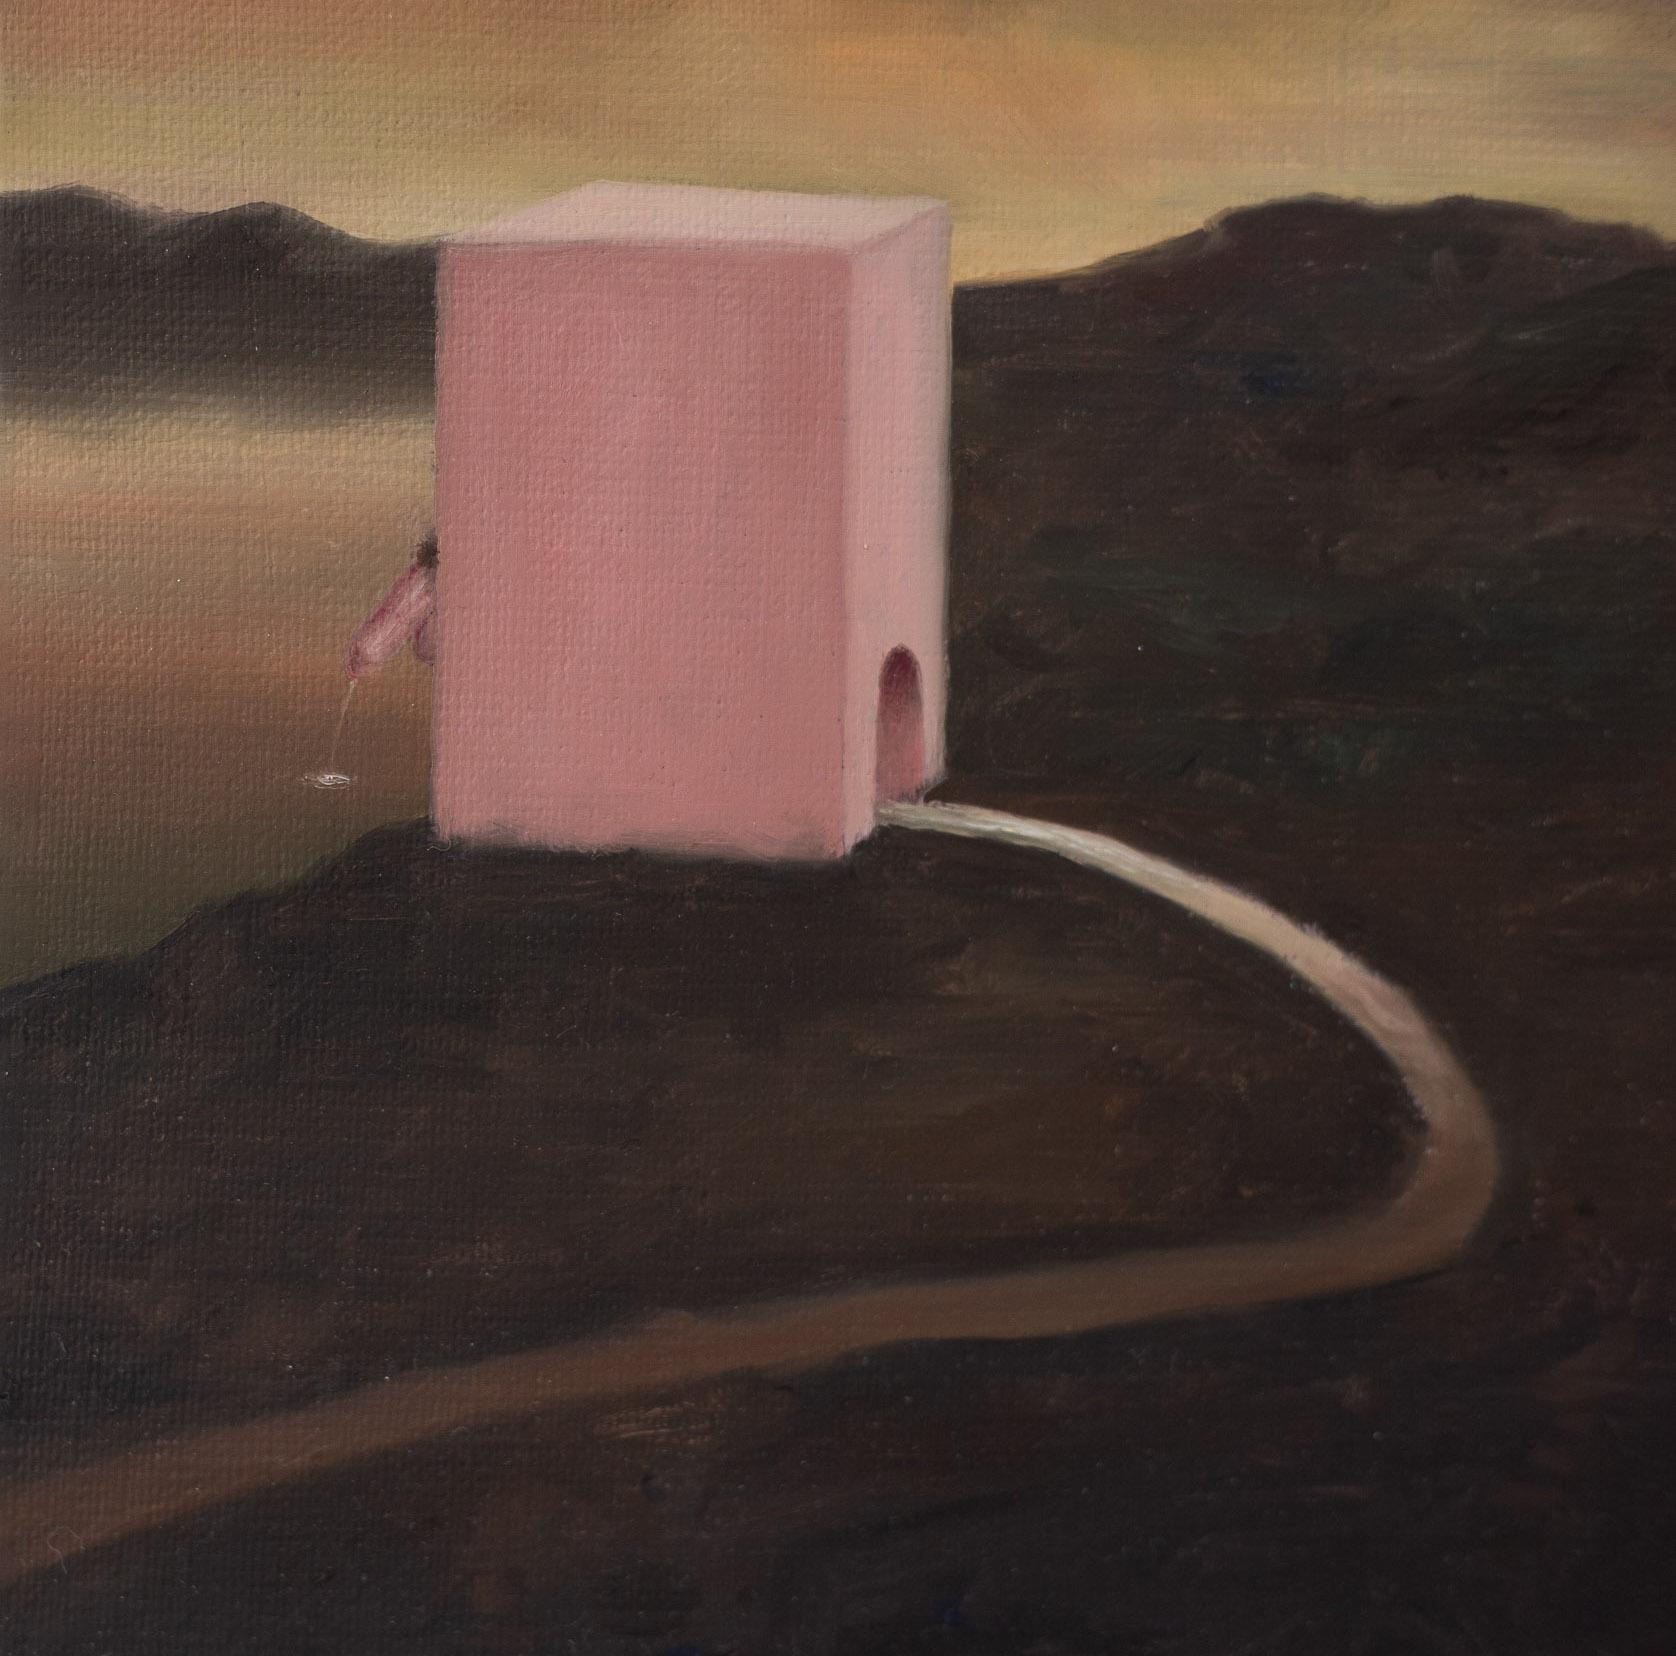 Francisco Sierra,  NeExBolígrafo  (series) (detail), 2015-ongoing, oil on board, 24 x 18 cm  Photo: Kilian Bannwart